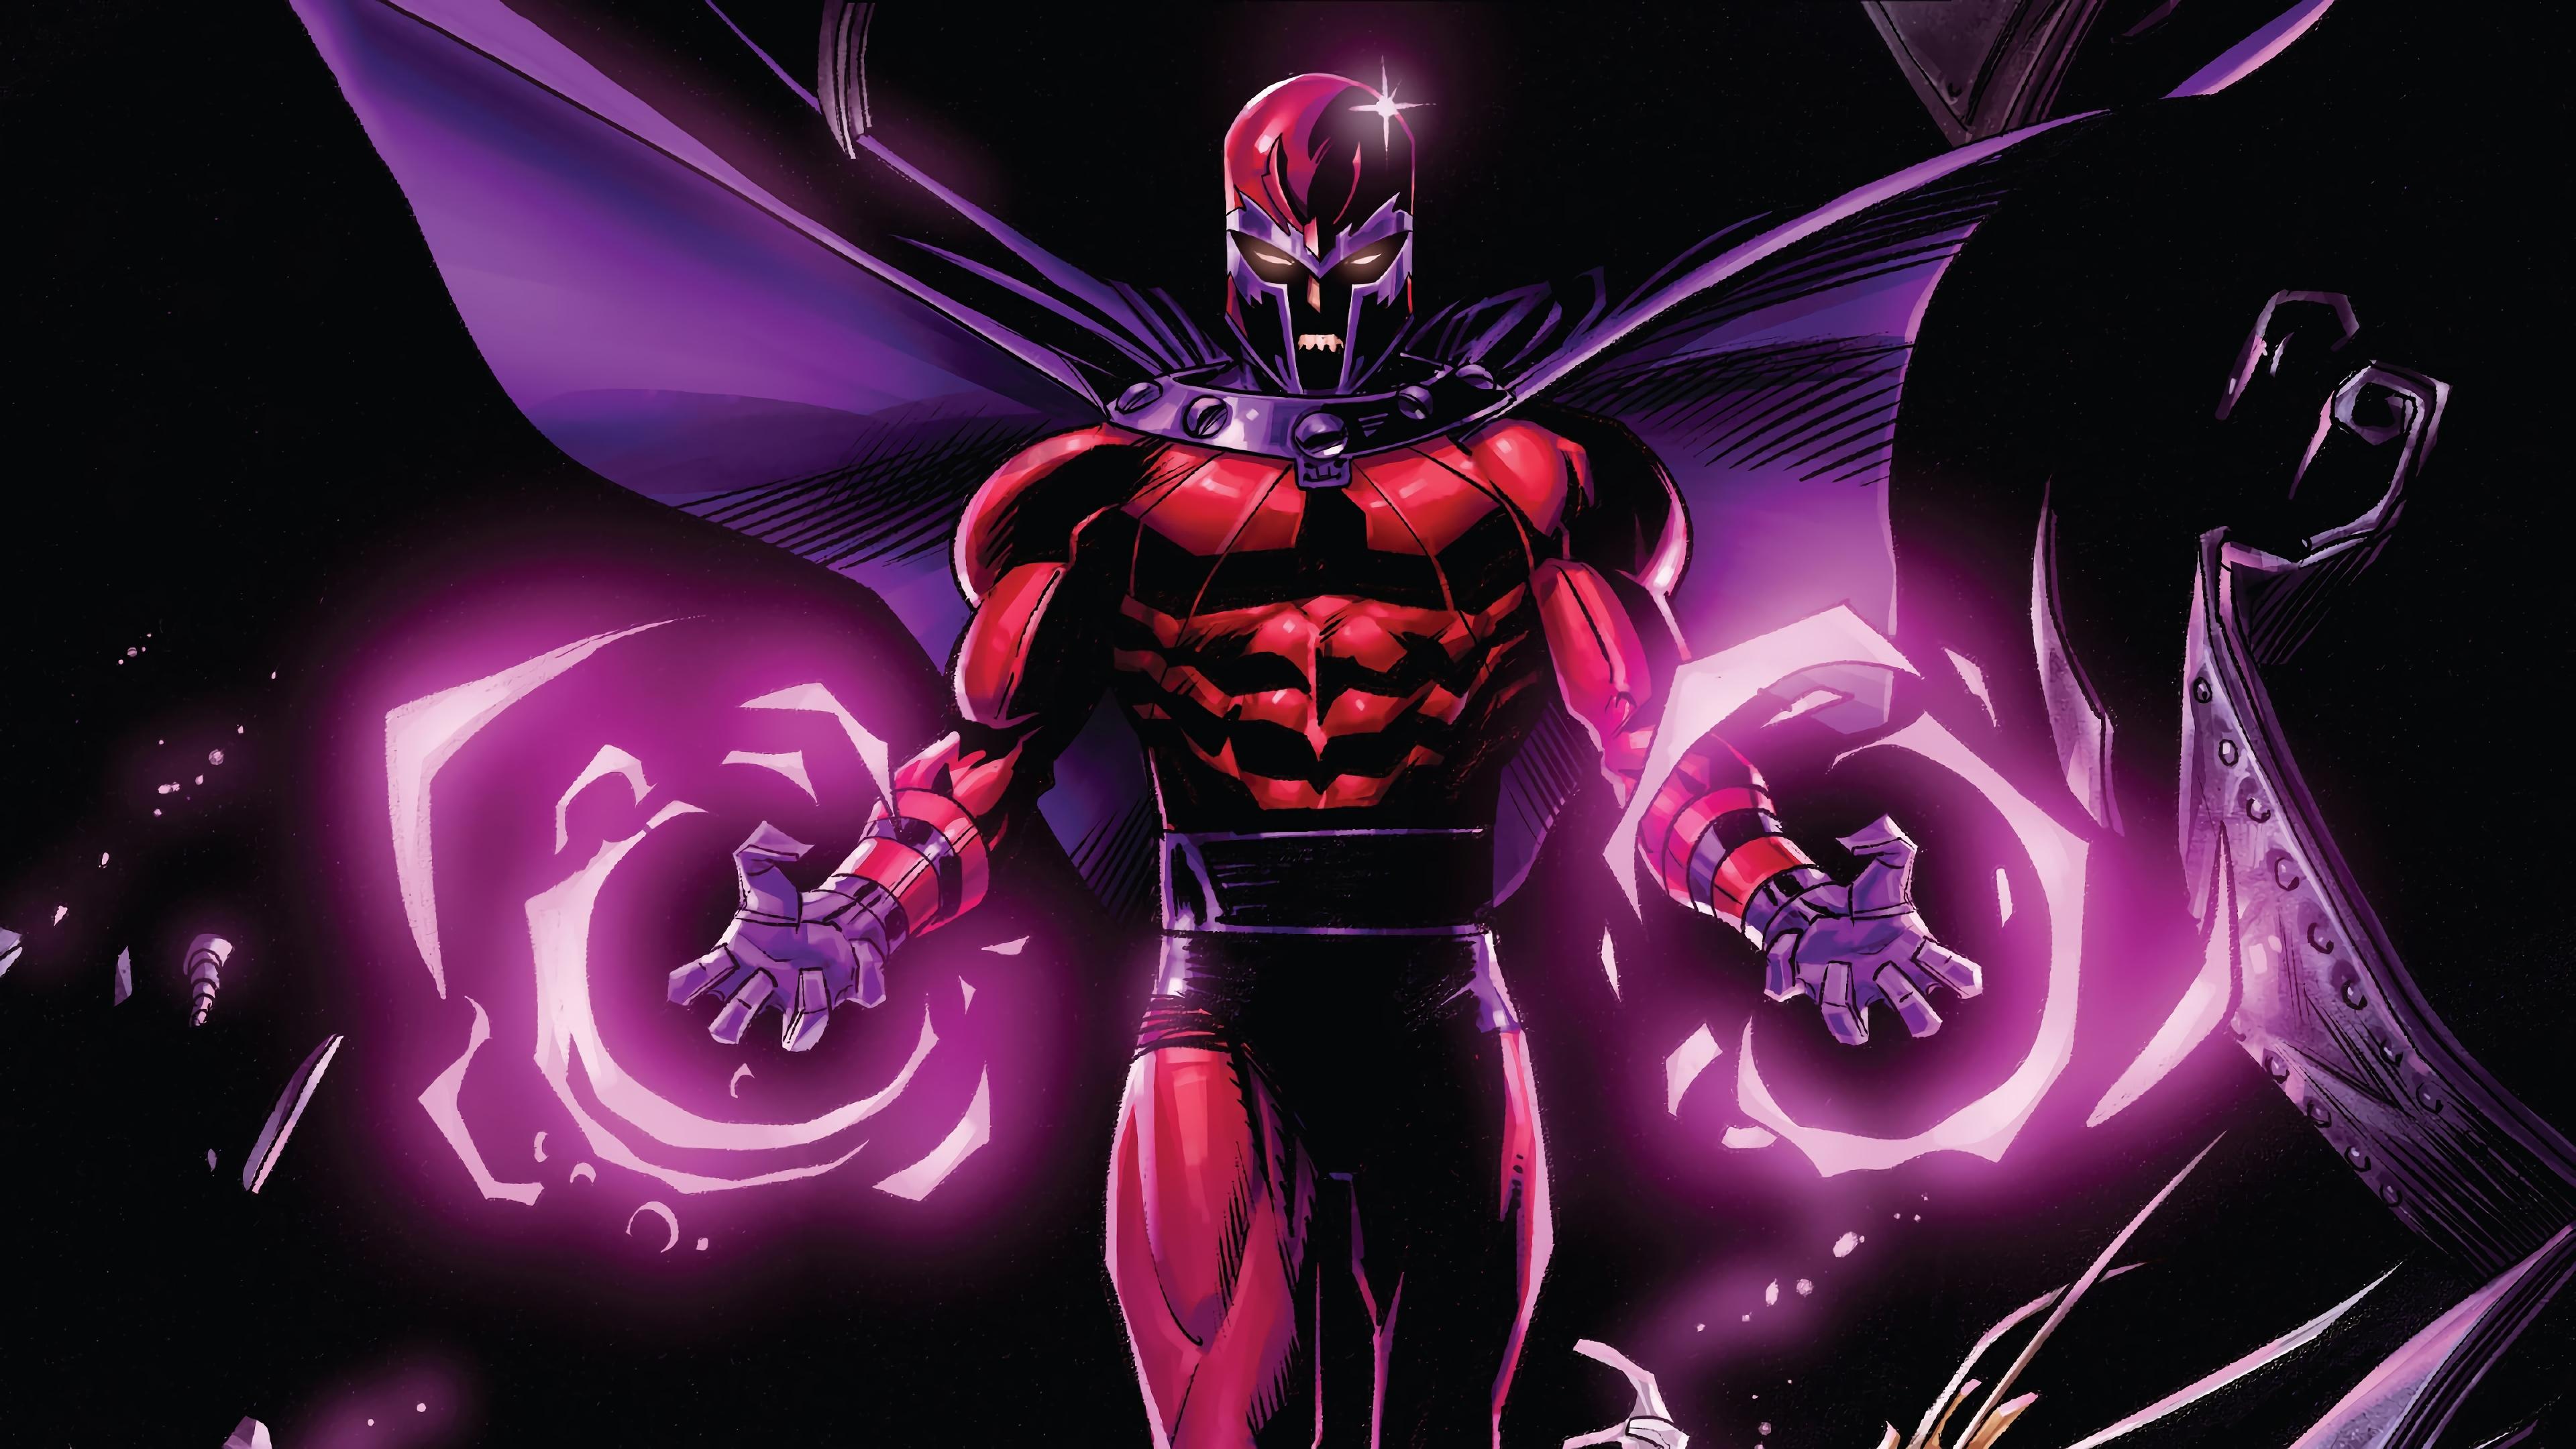 Magneto Marvel Comics 4K 4276 3840x2160